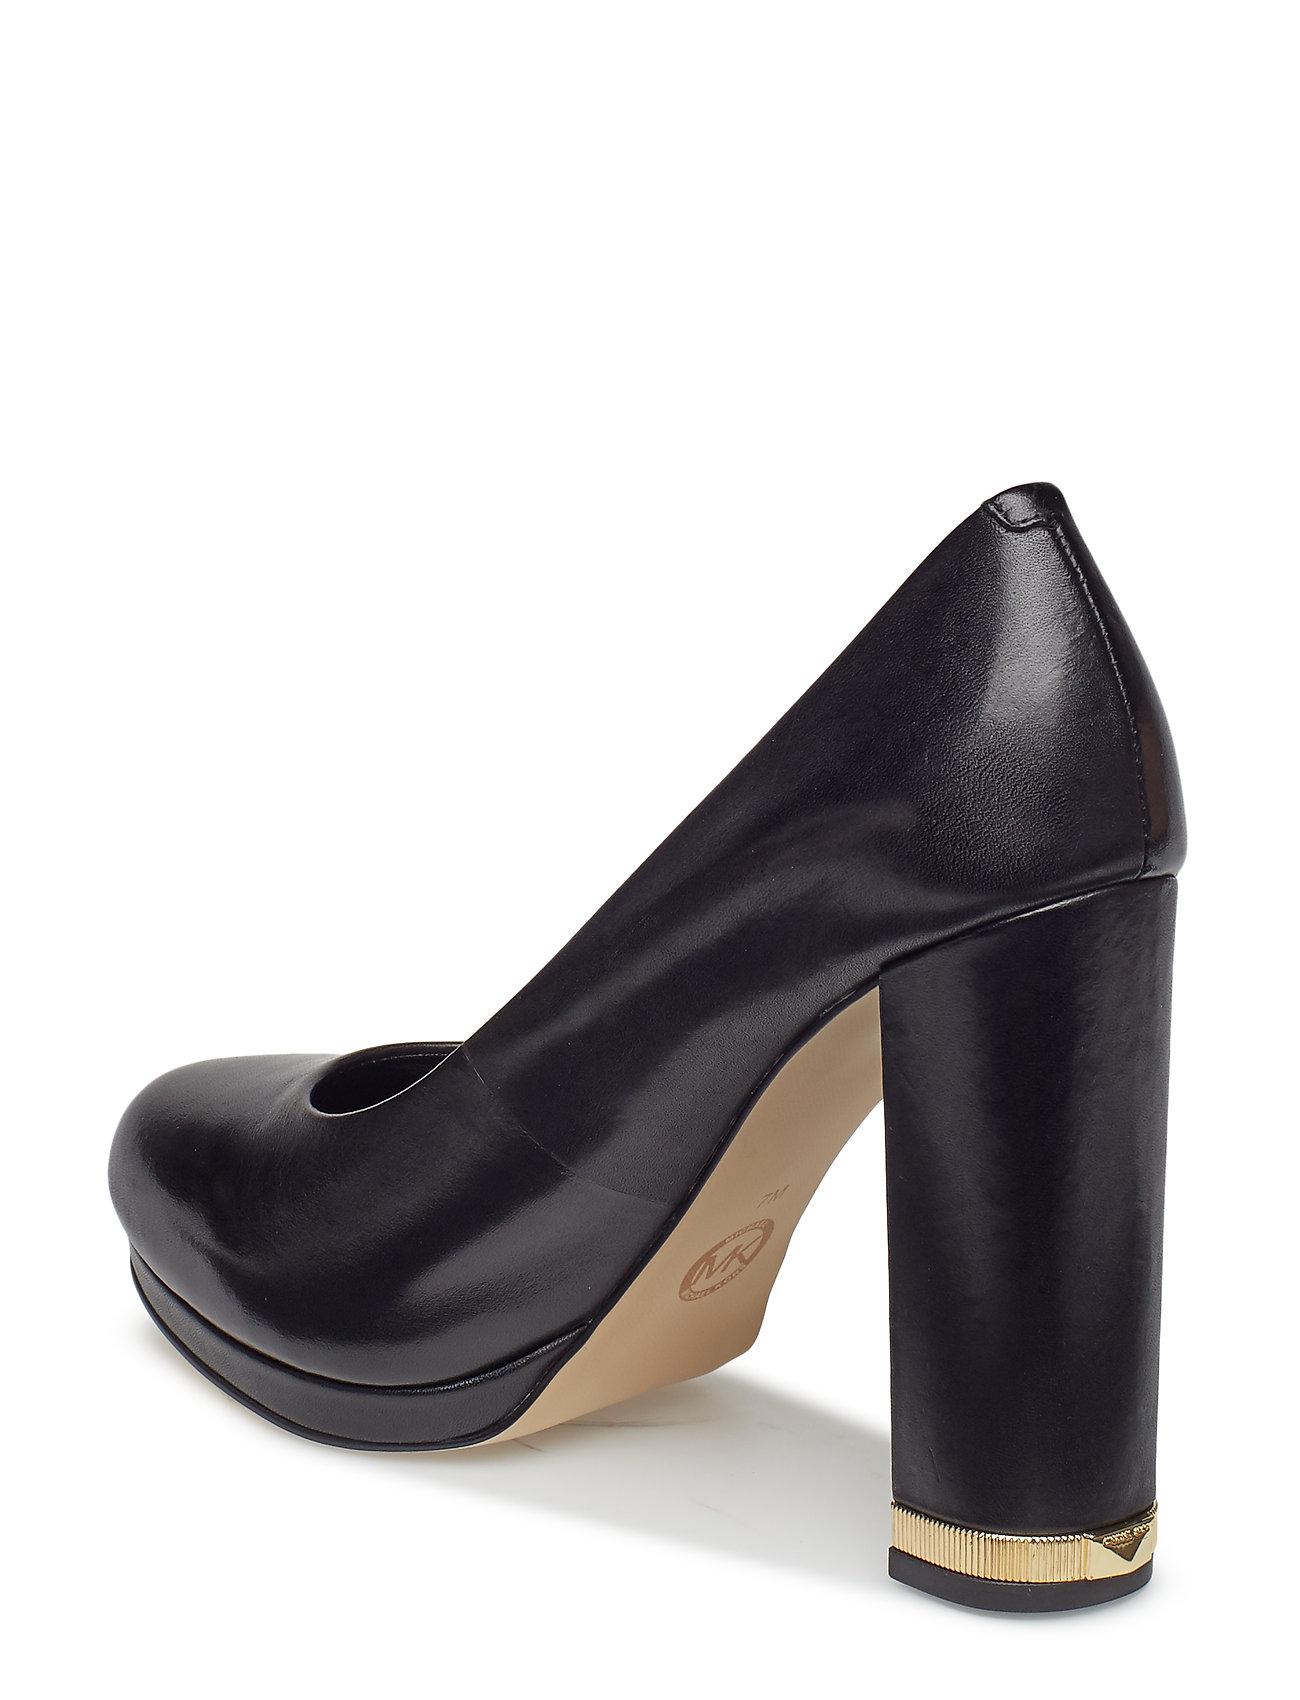 Shoes Kors ToeblackMichael ToeblackMichael Closed Closed Valerie Kors Shoes Valerie vO08nmNw